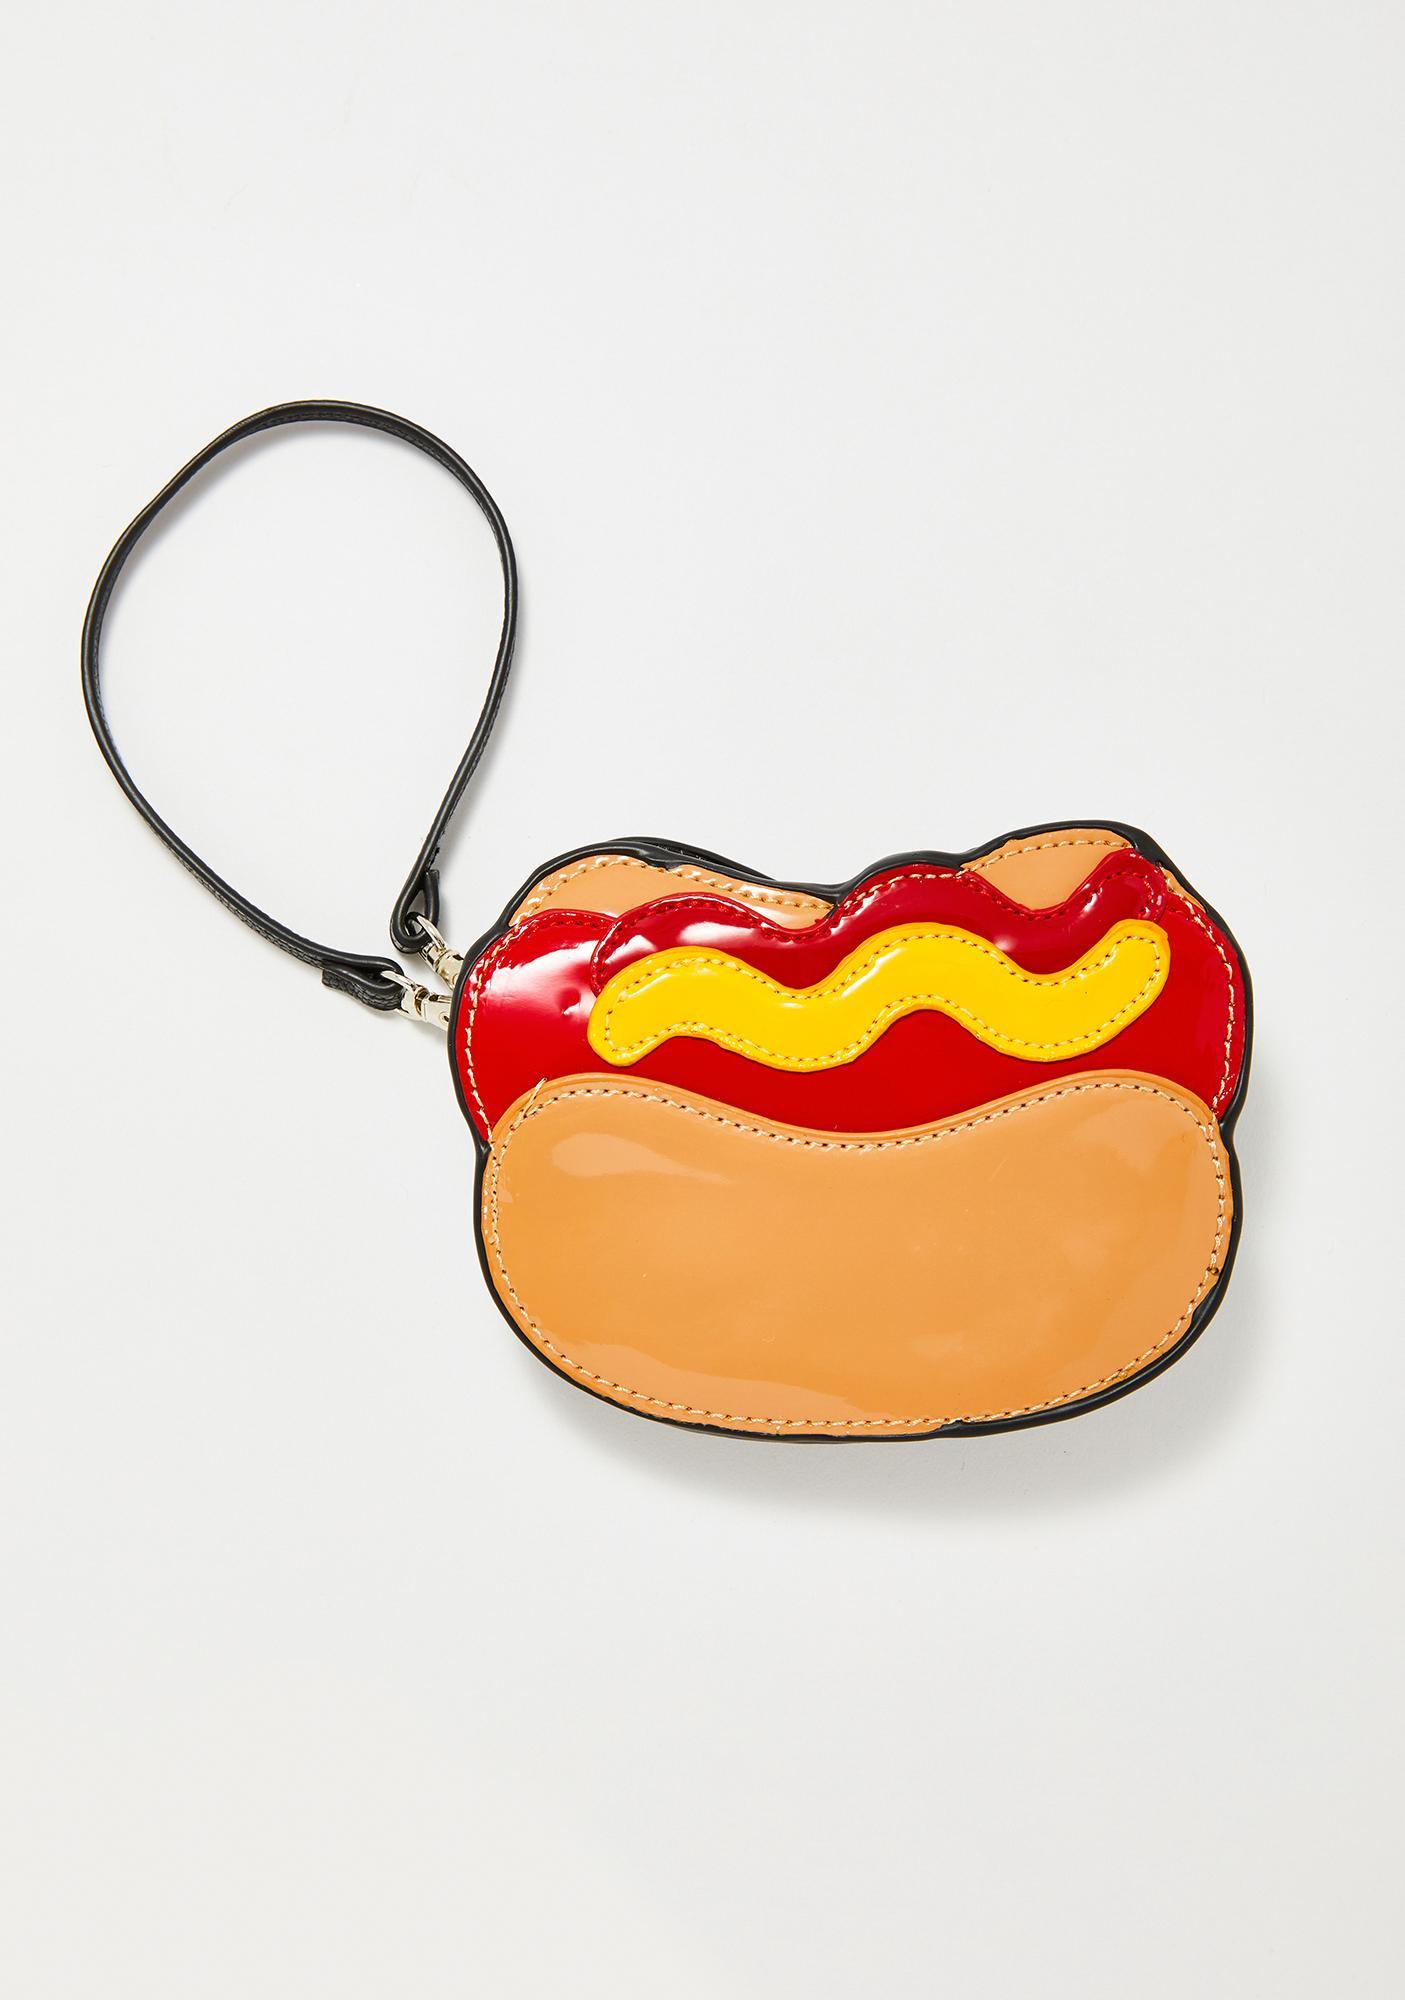 American Made Hot Dog Clutch